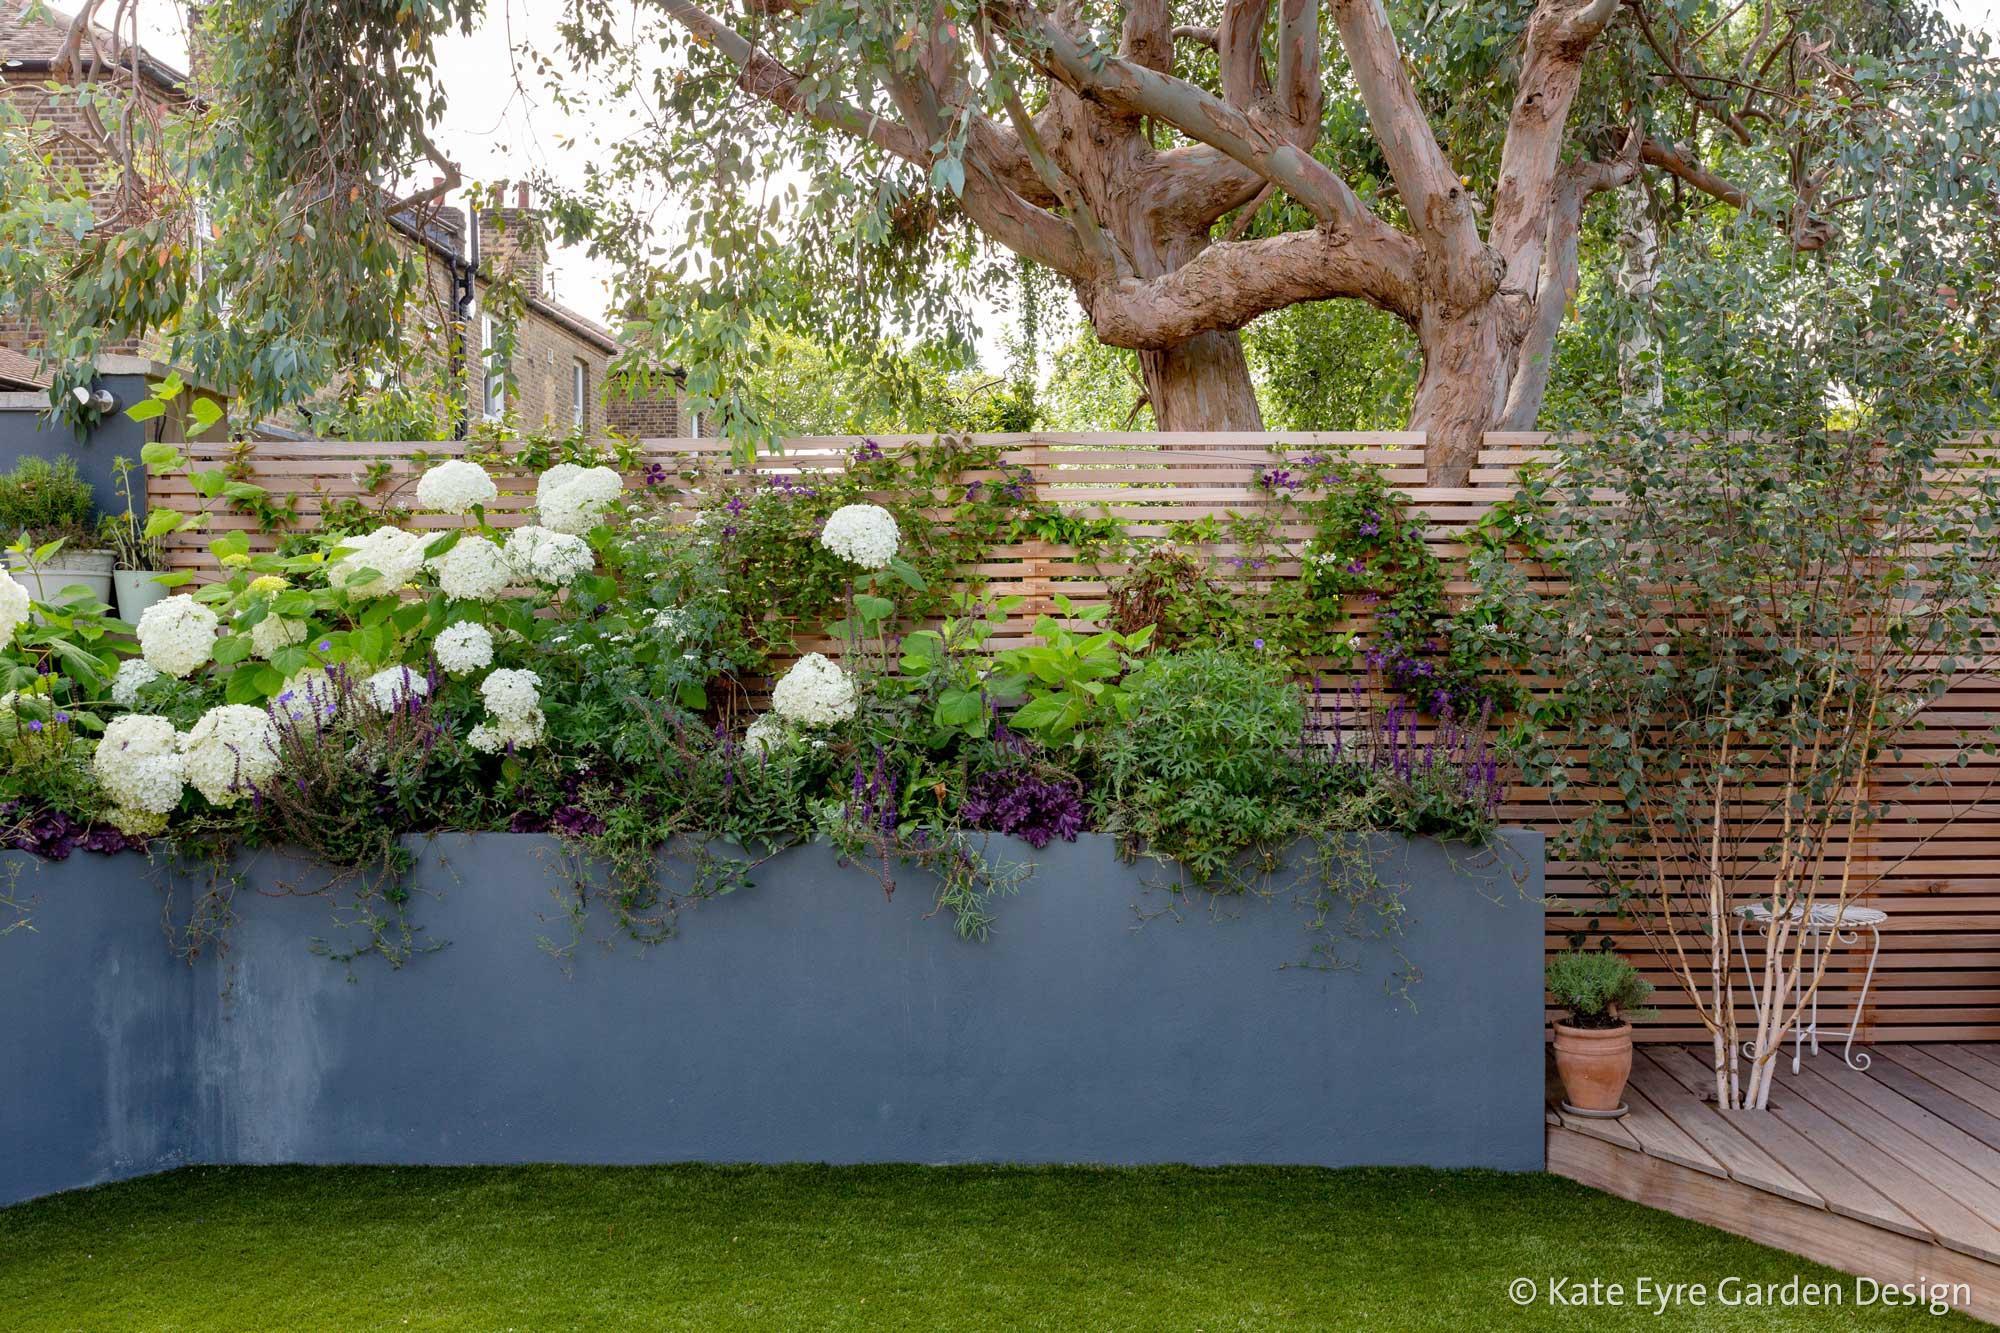 Ildersly Grove 7: raised planters